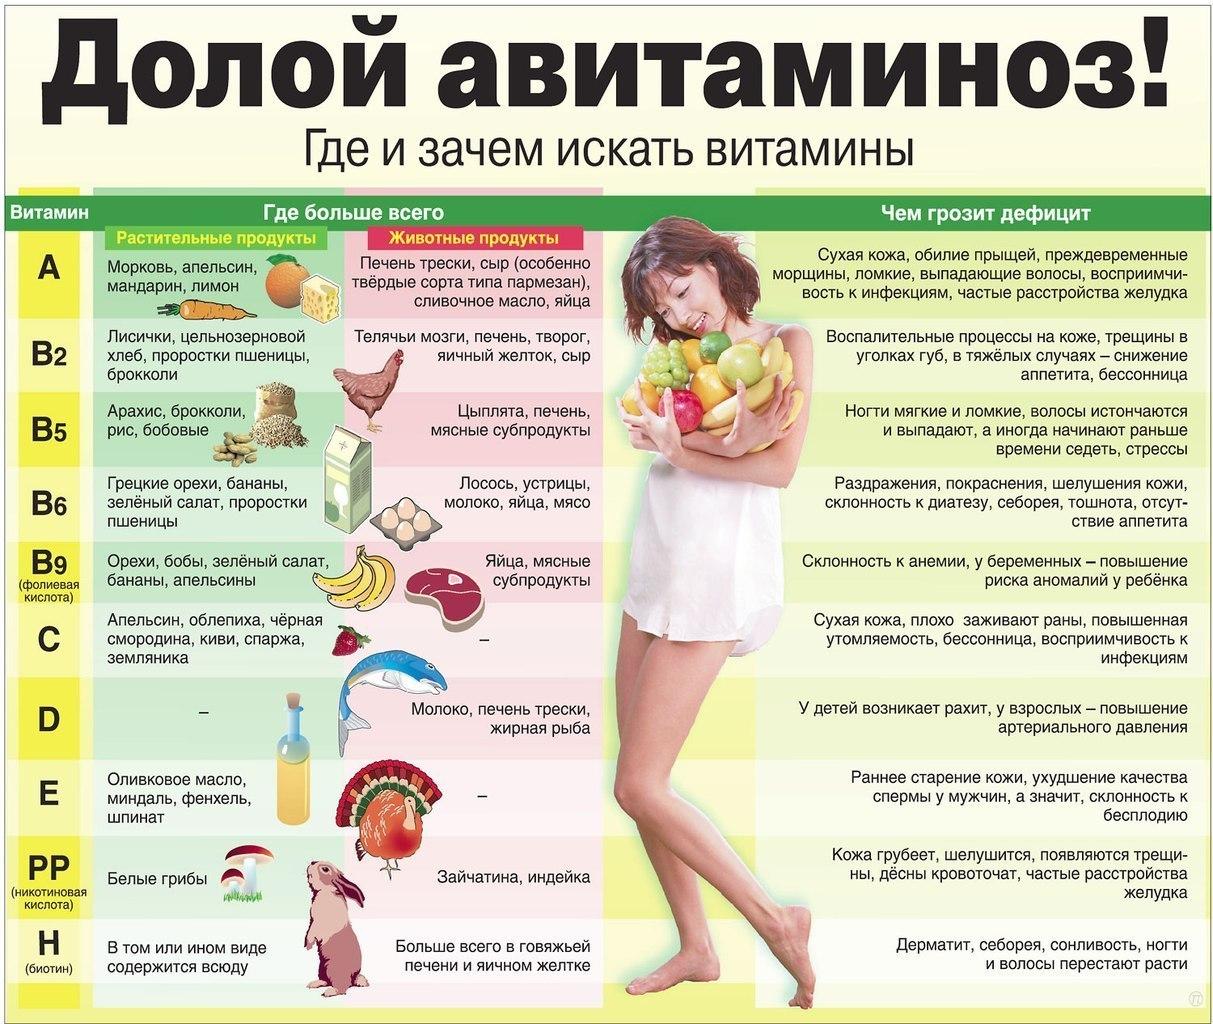 http://ic.pics.livejournal.com/julia_bannykh/50738235/1154947/1154947_original.jpg